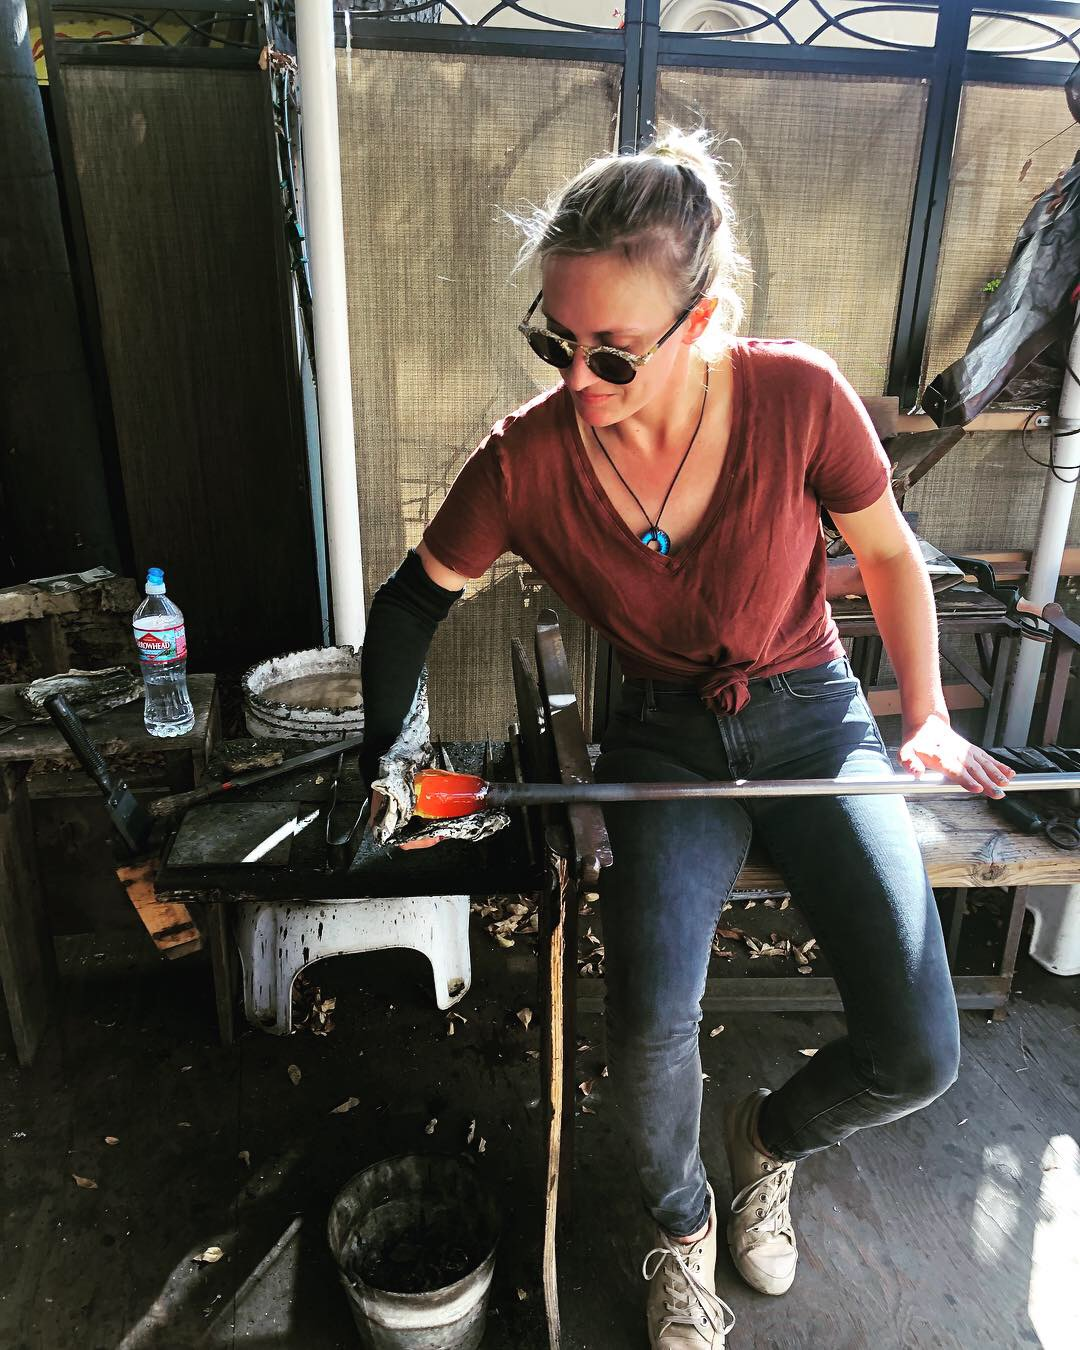 Brooke_glassblowing_1.JPG